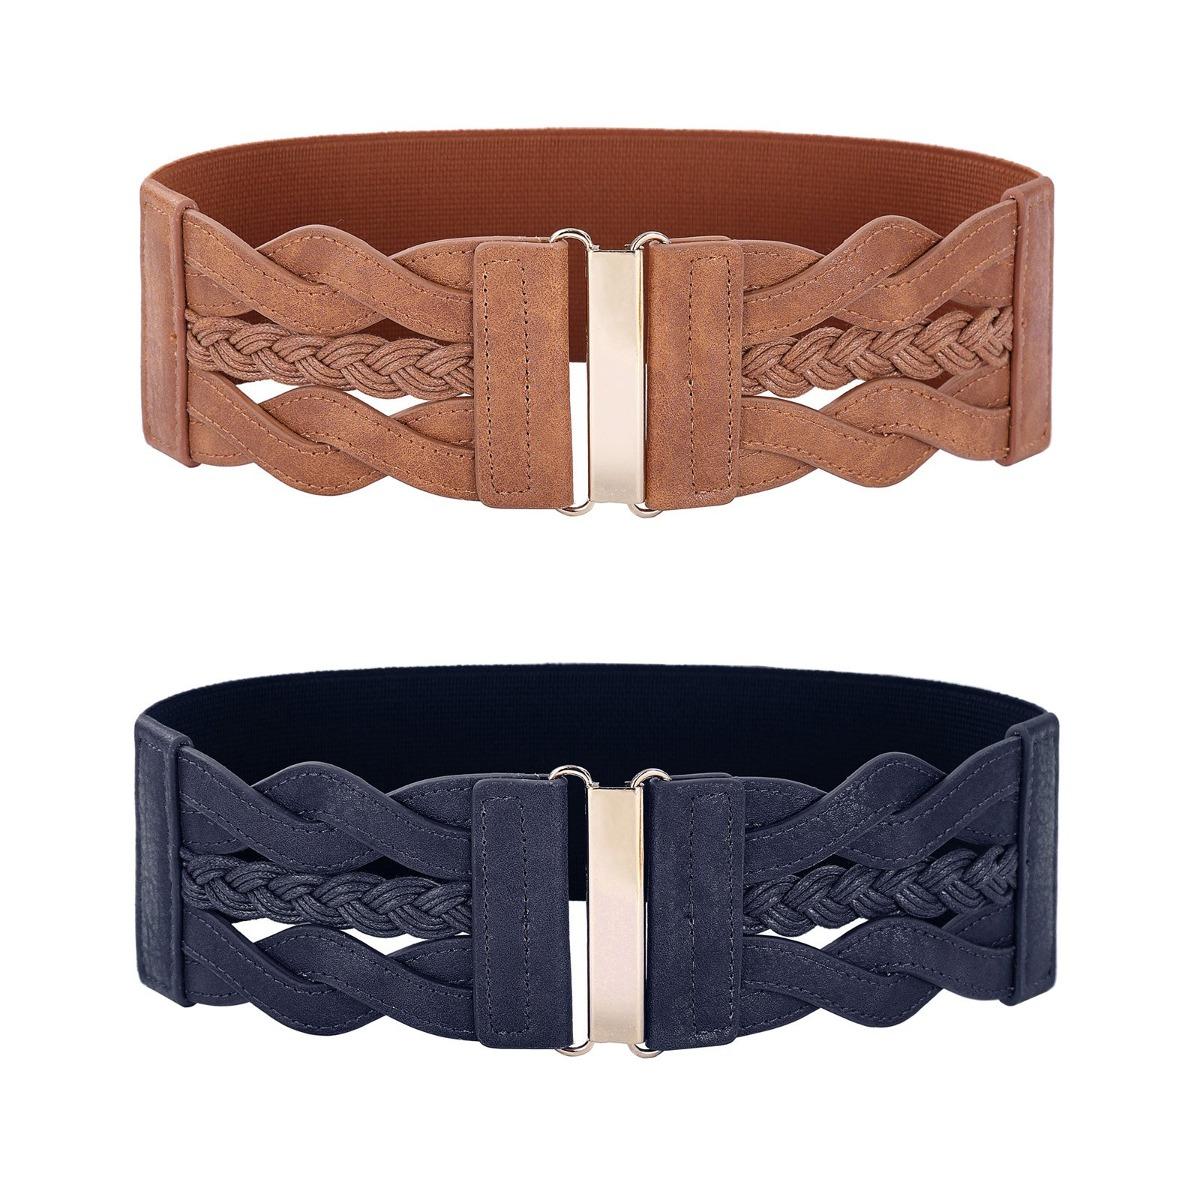 comprar popular a8673 e17d3 Correa Trenzada Para Mujer Cinturón Elástico De Cintura A